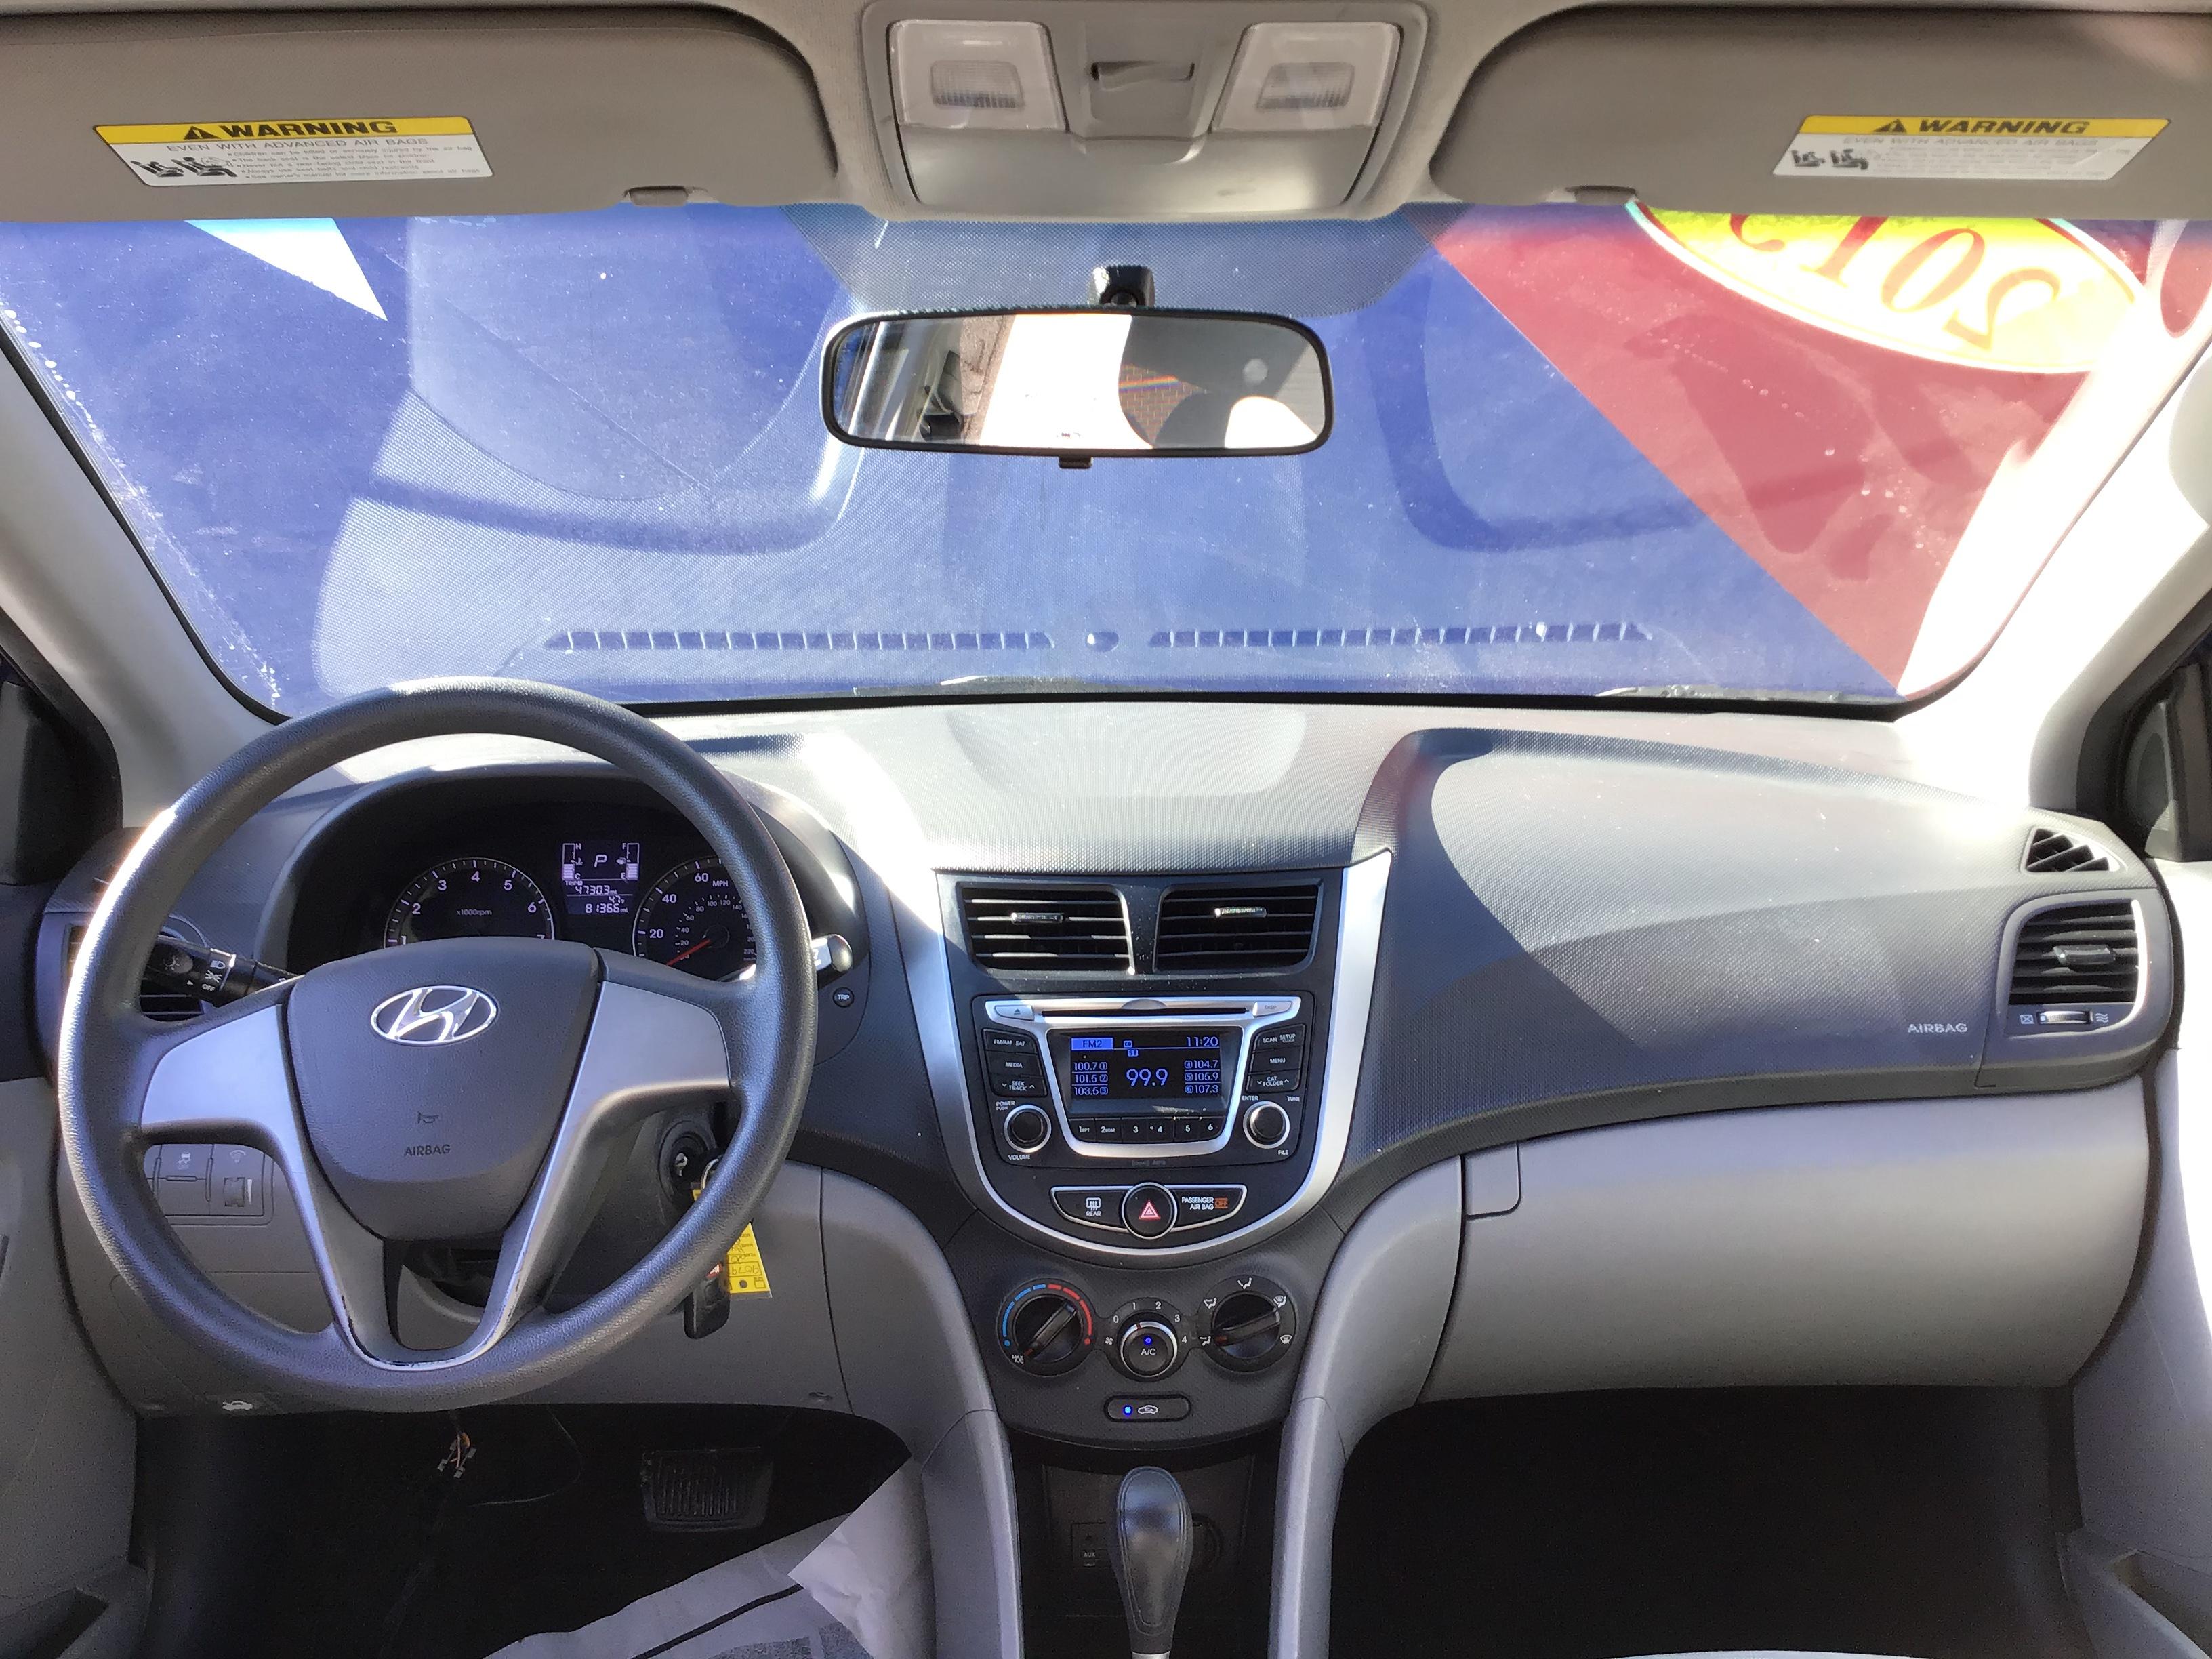 used vehicle - Sedan HYUNDAI ACCENT 2015